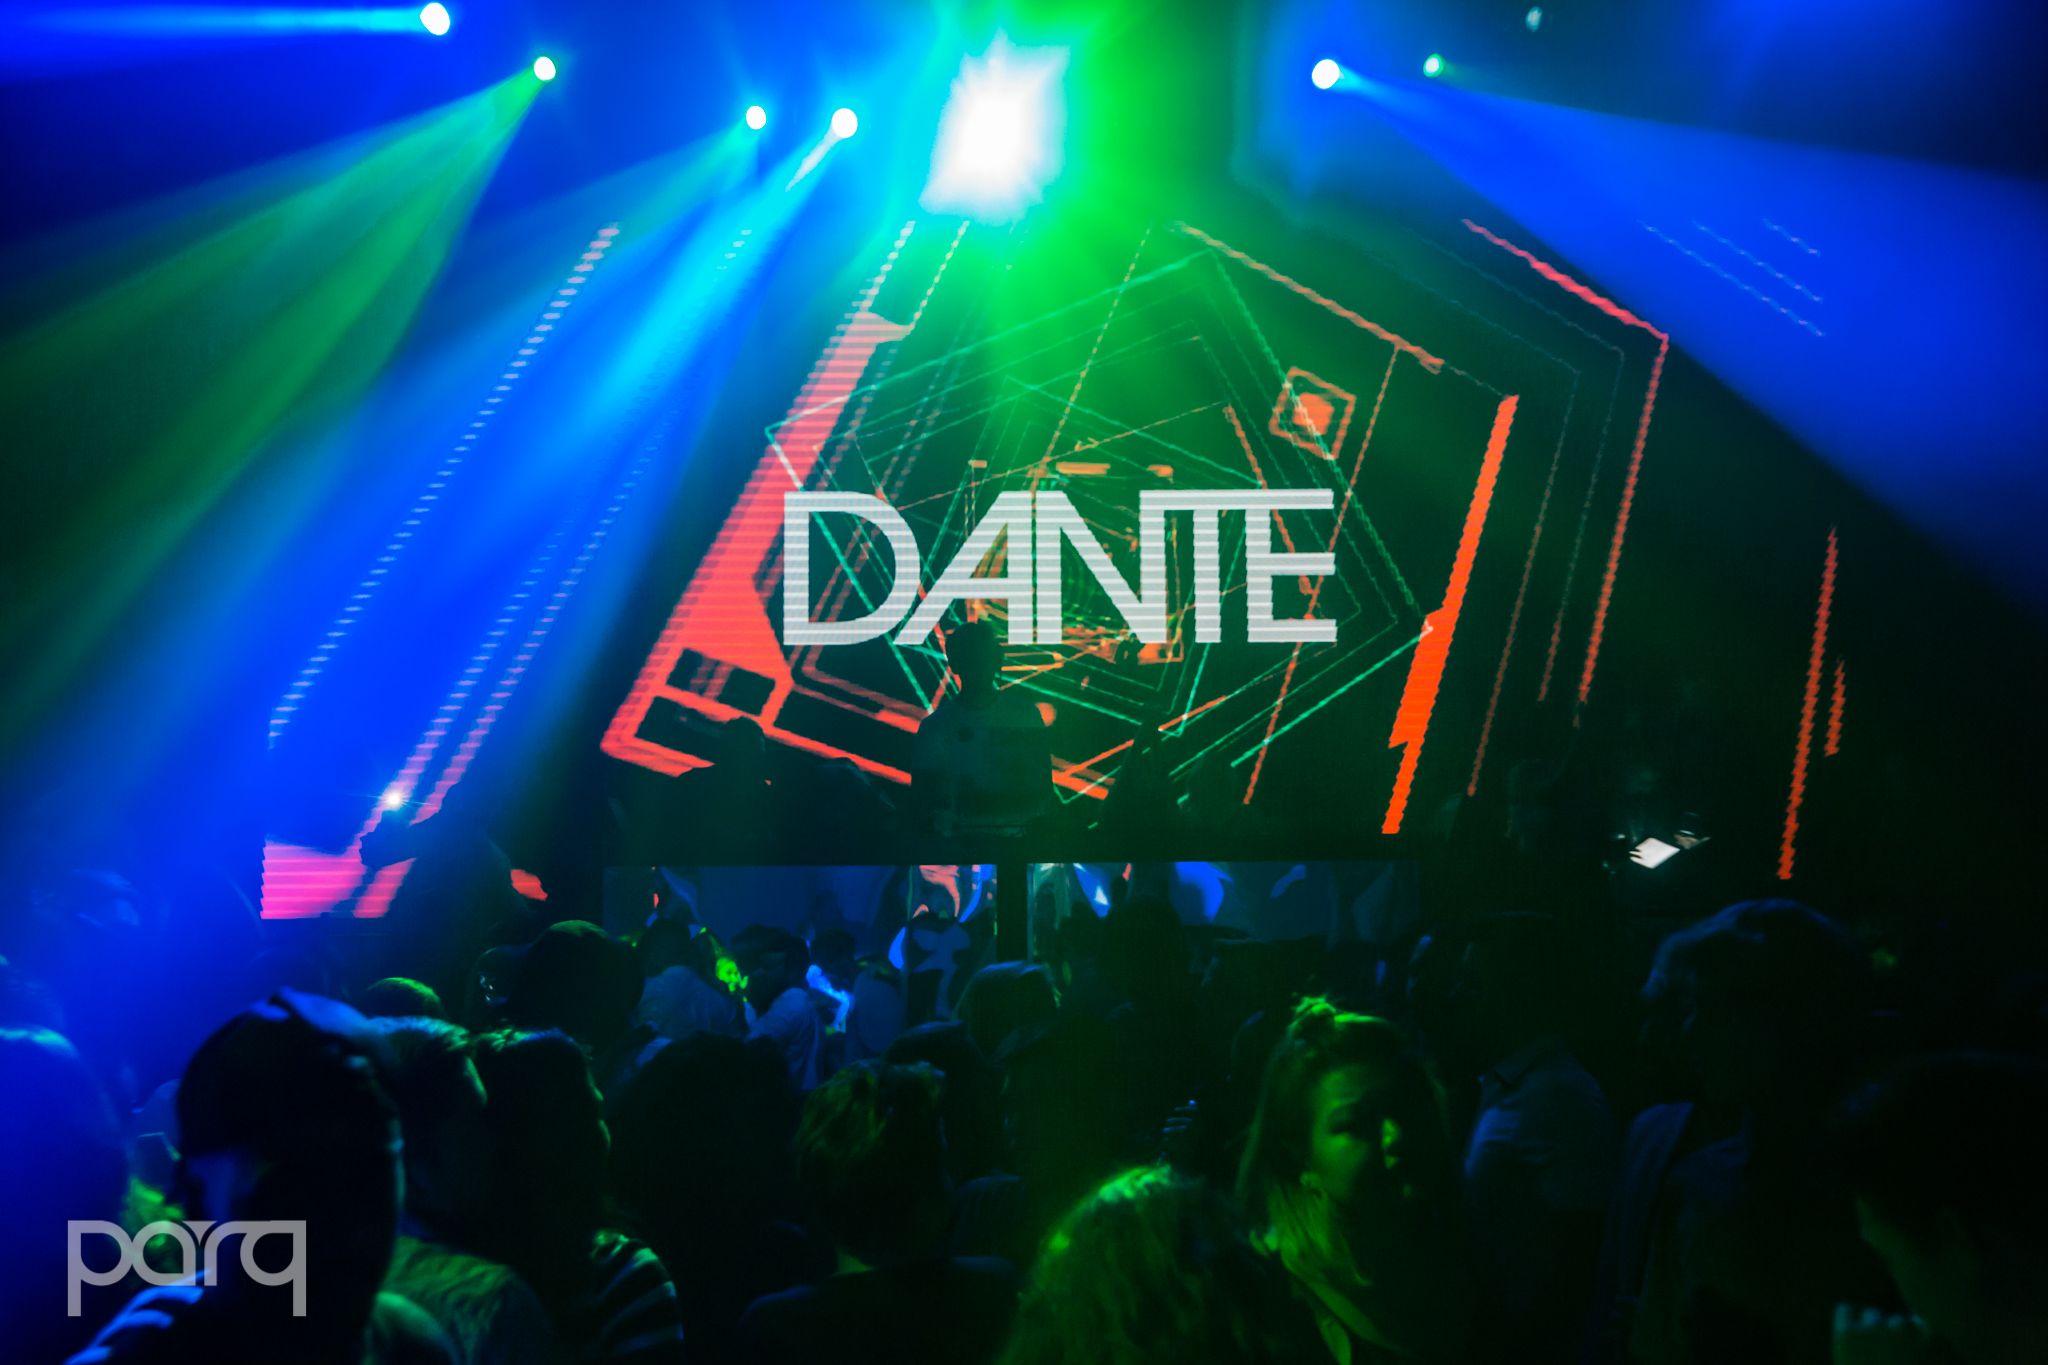 10.05.18 Parq - Dante-1.jpg